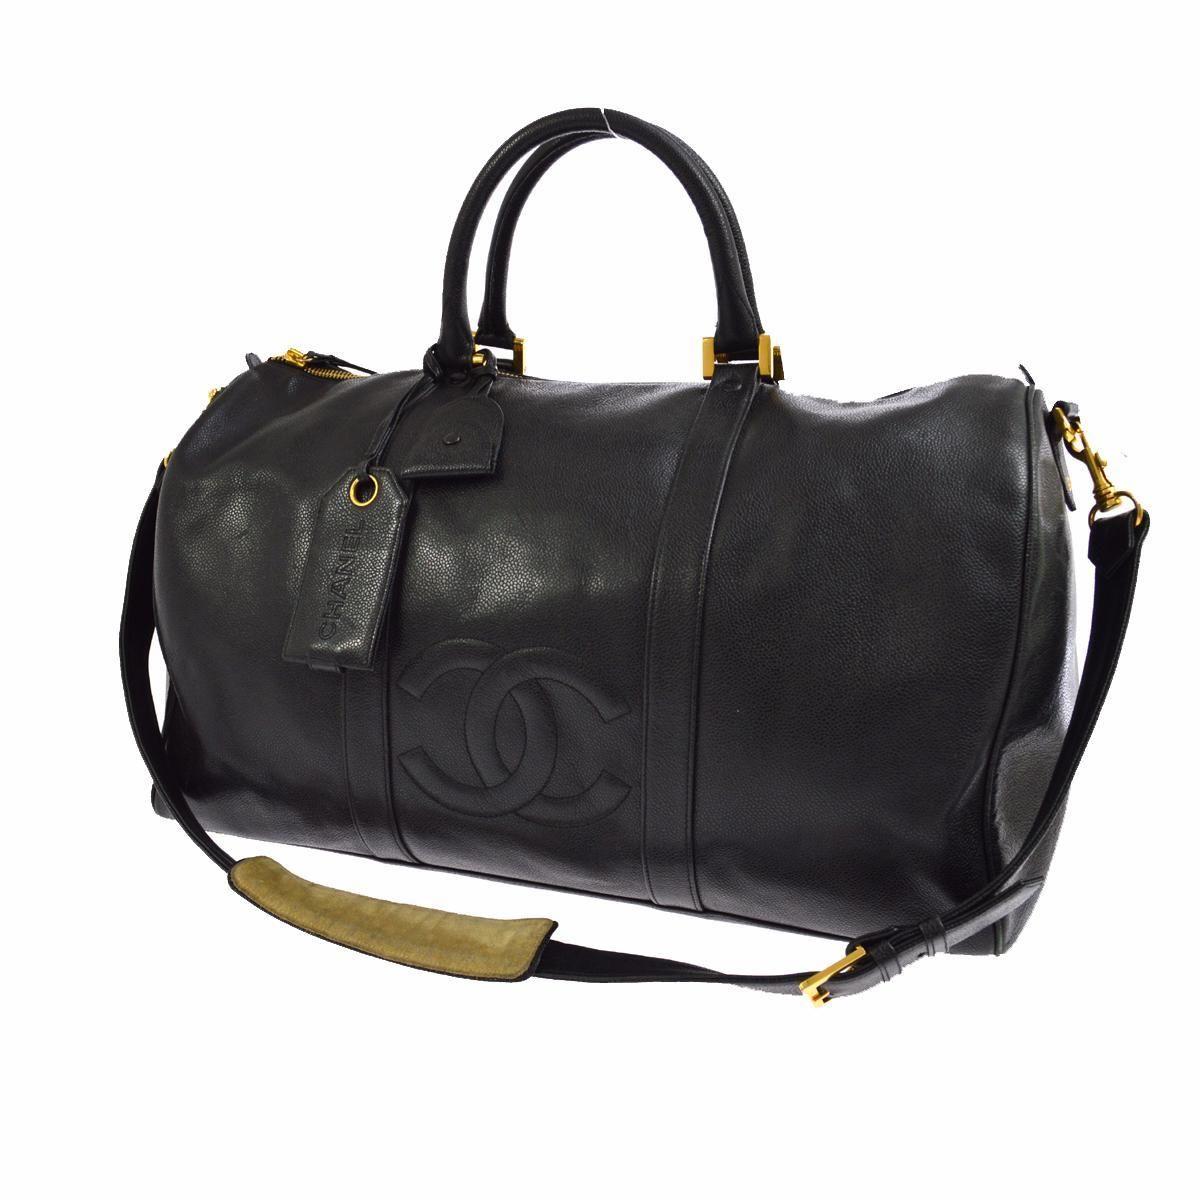 7adc0da2cedb Chanel Cc Jumbo Boston Black Travel Bag. Save 50% on the Chanel Cc Jumbo  Boston Black Travel Bag! This travel bag is a top 10 member favorite on  Tradesy.